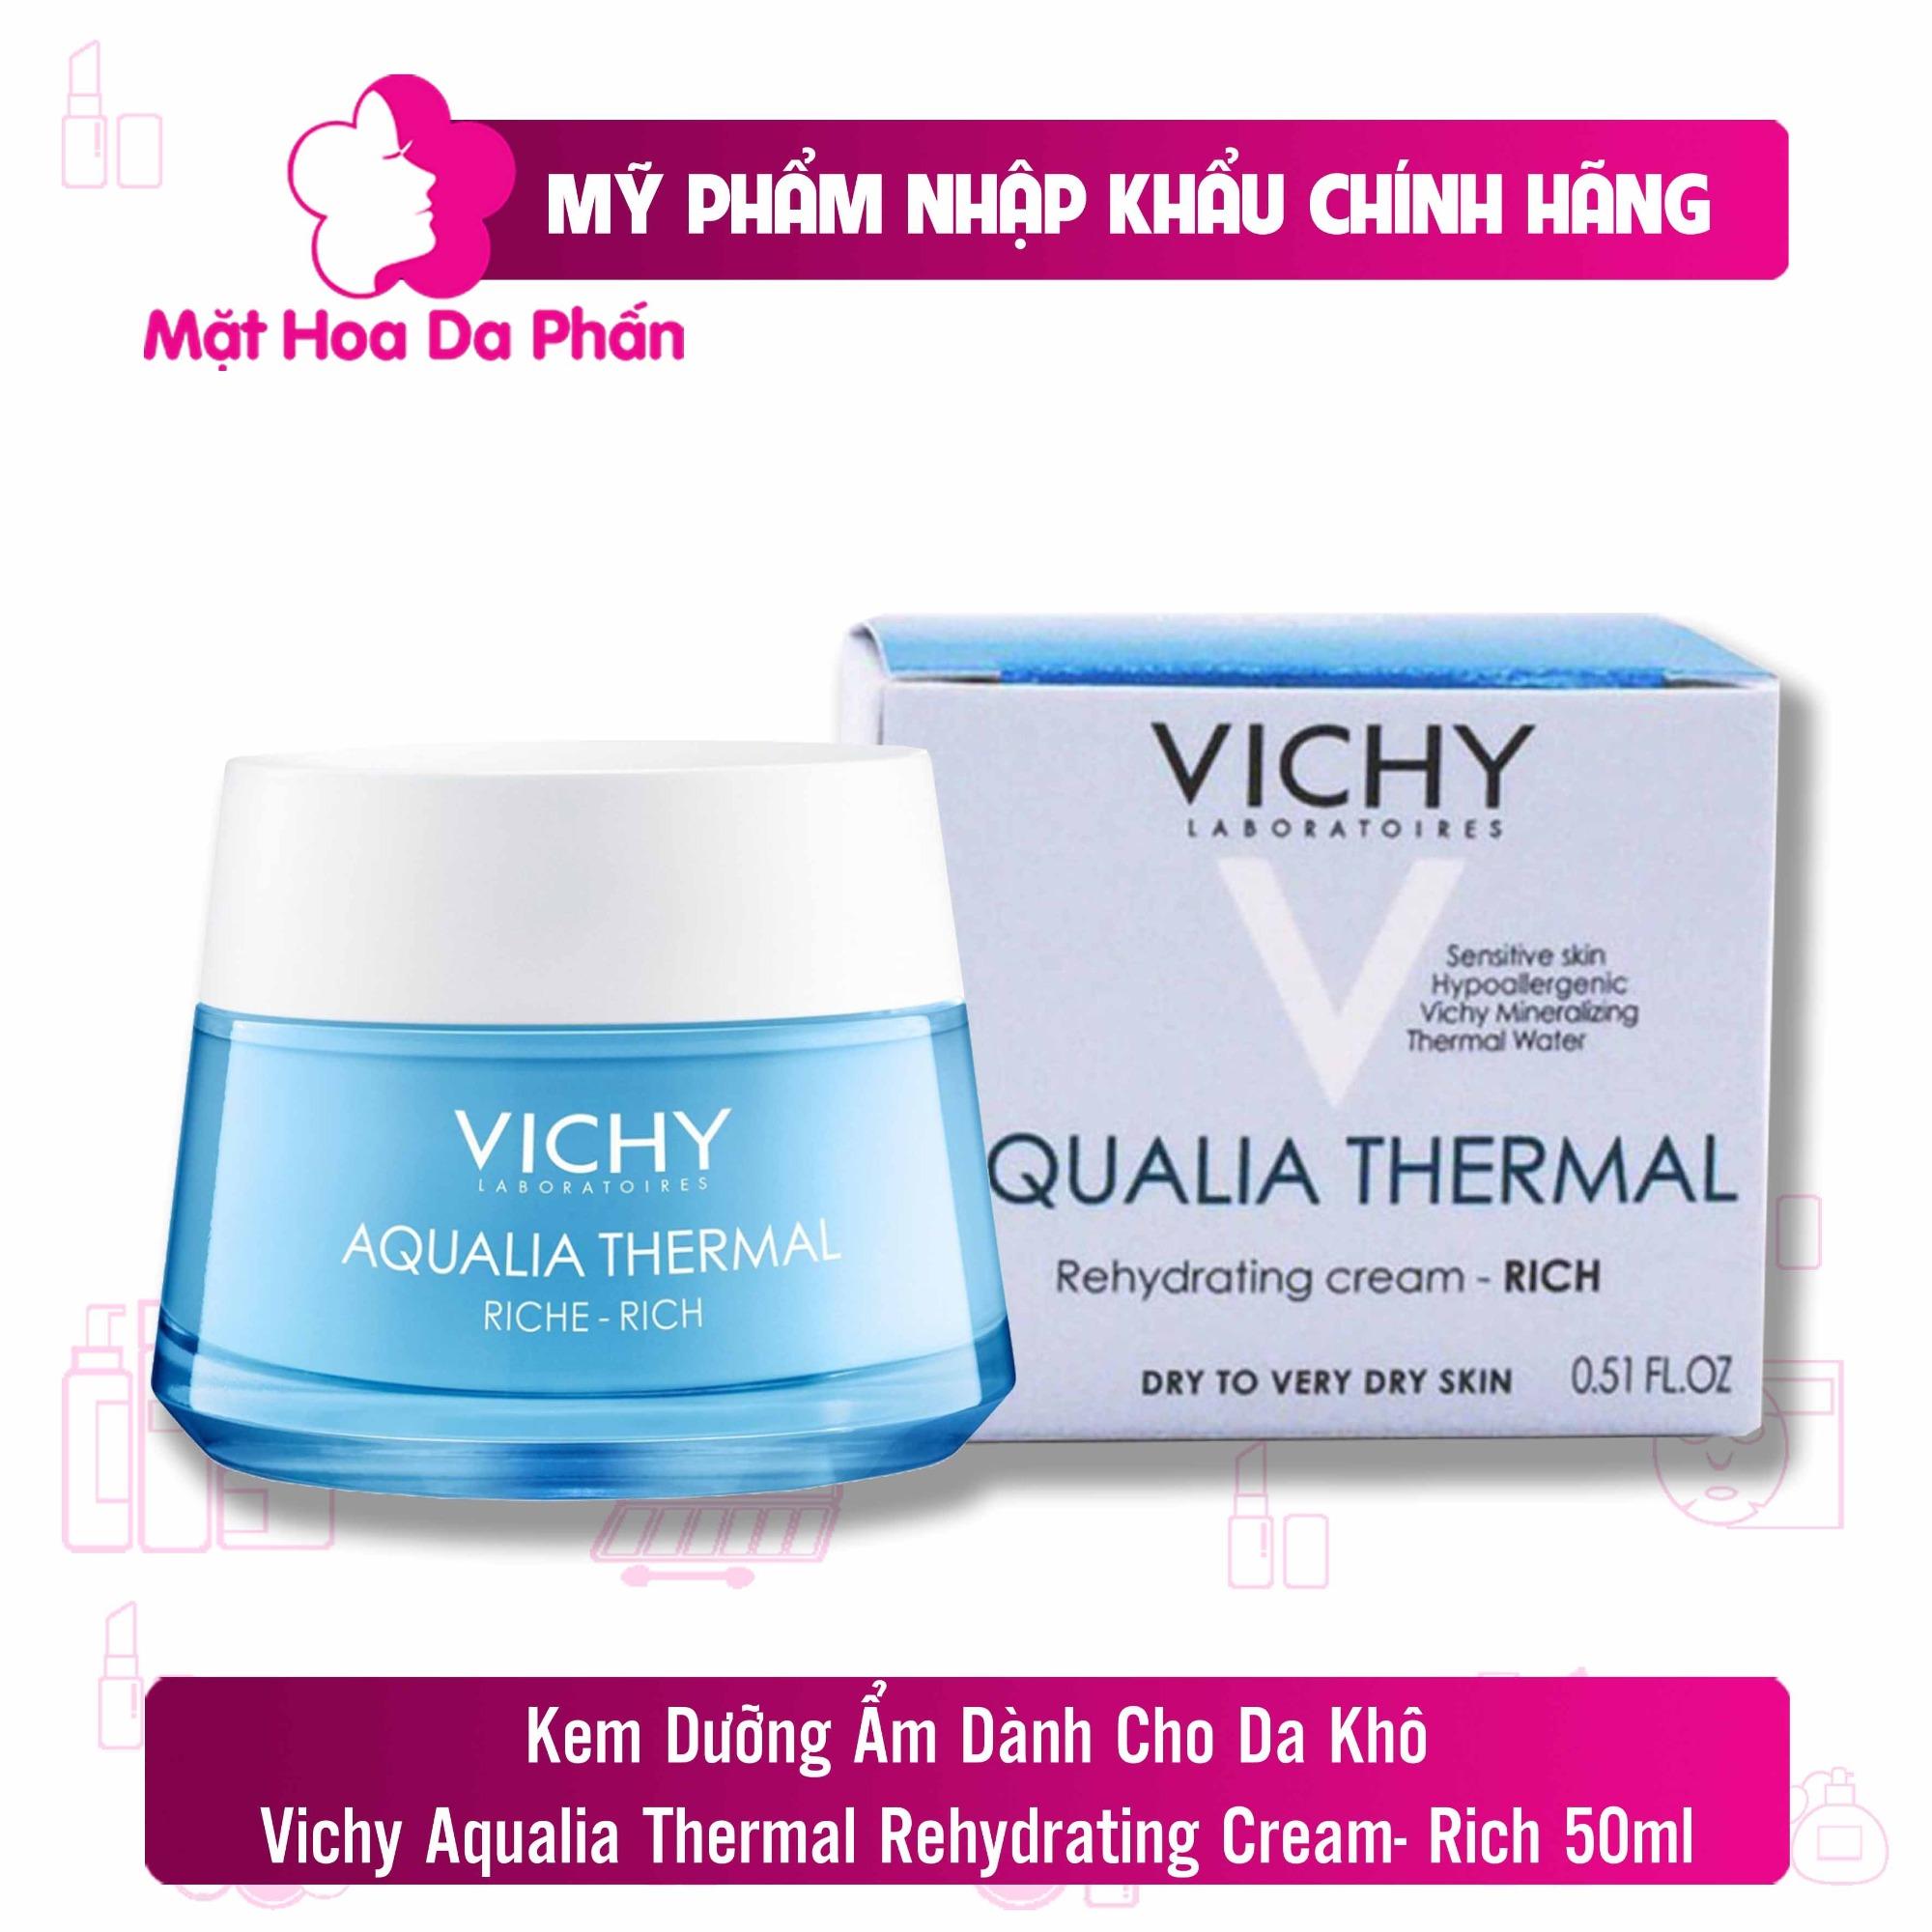 Kem Dưỡng Vichy Aqualia Thermal Rehydrating Cream- Riche 50ml